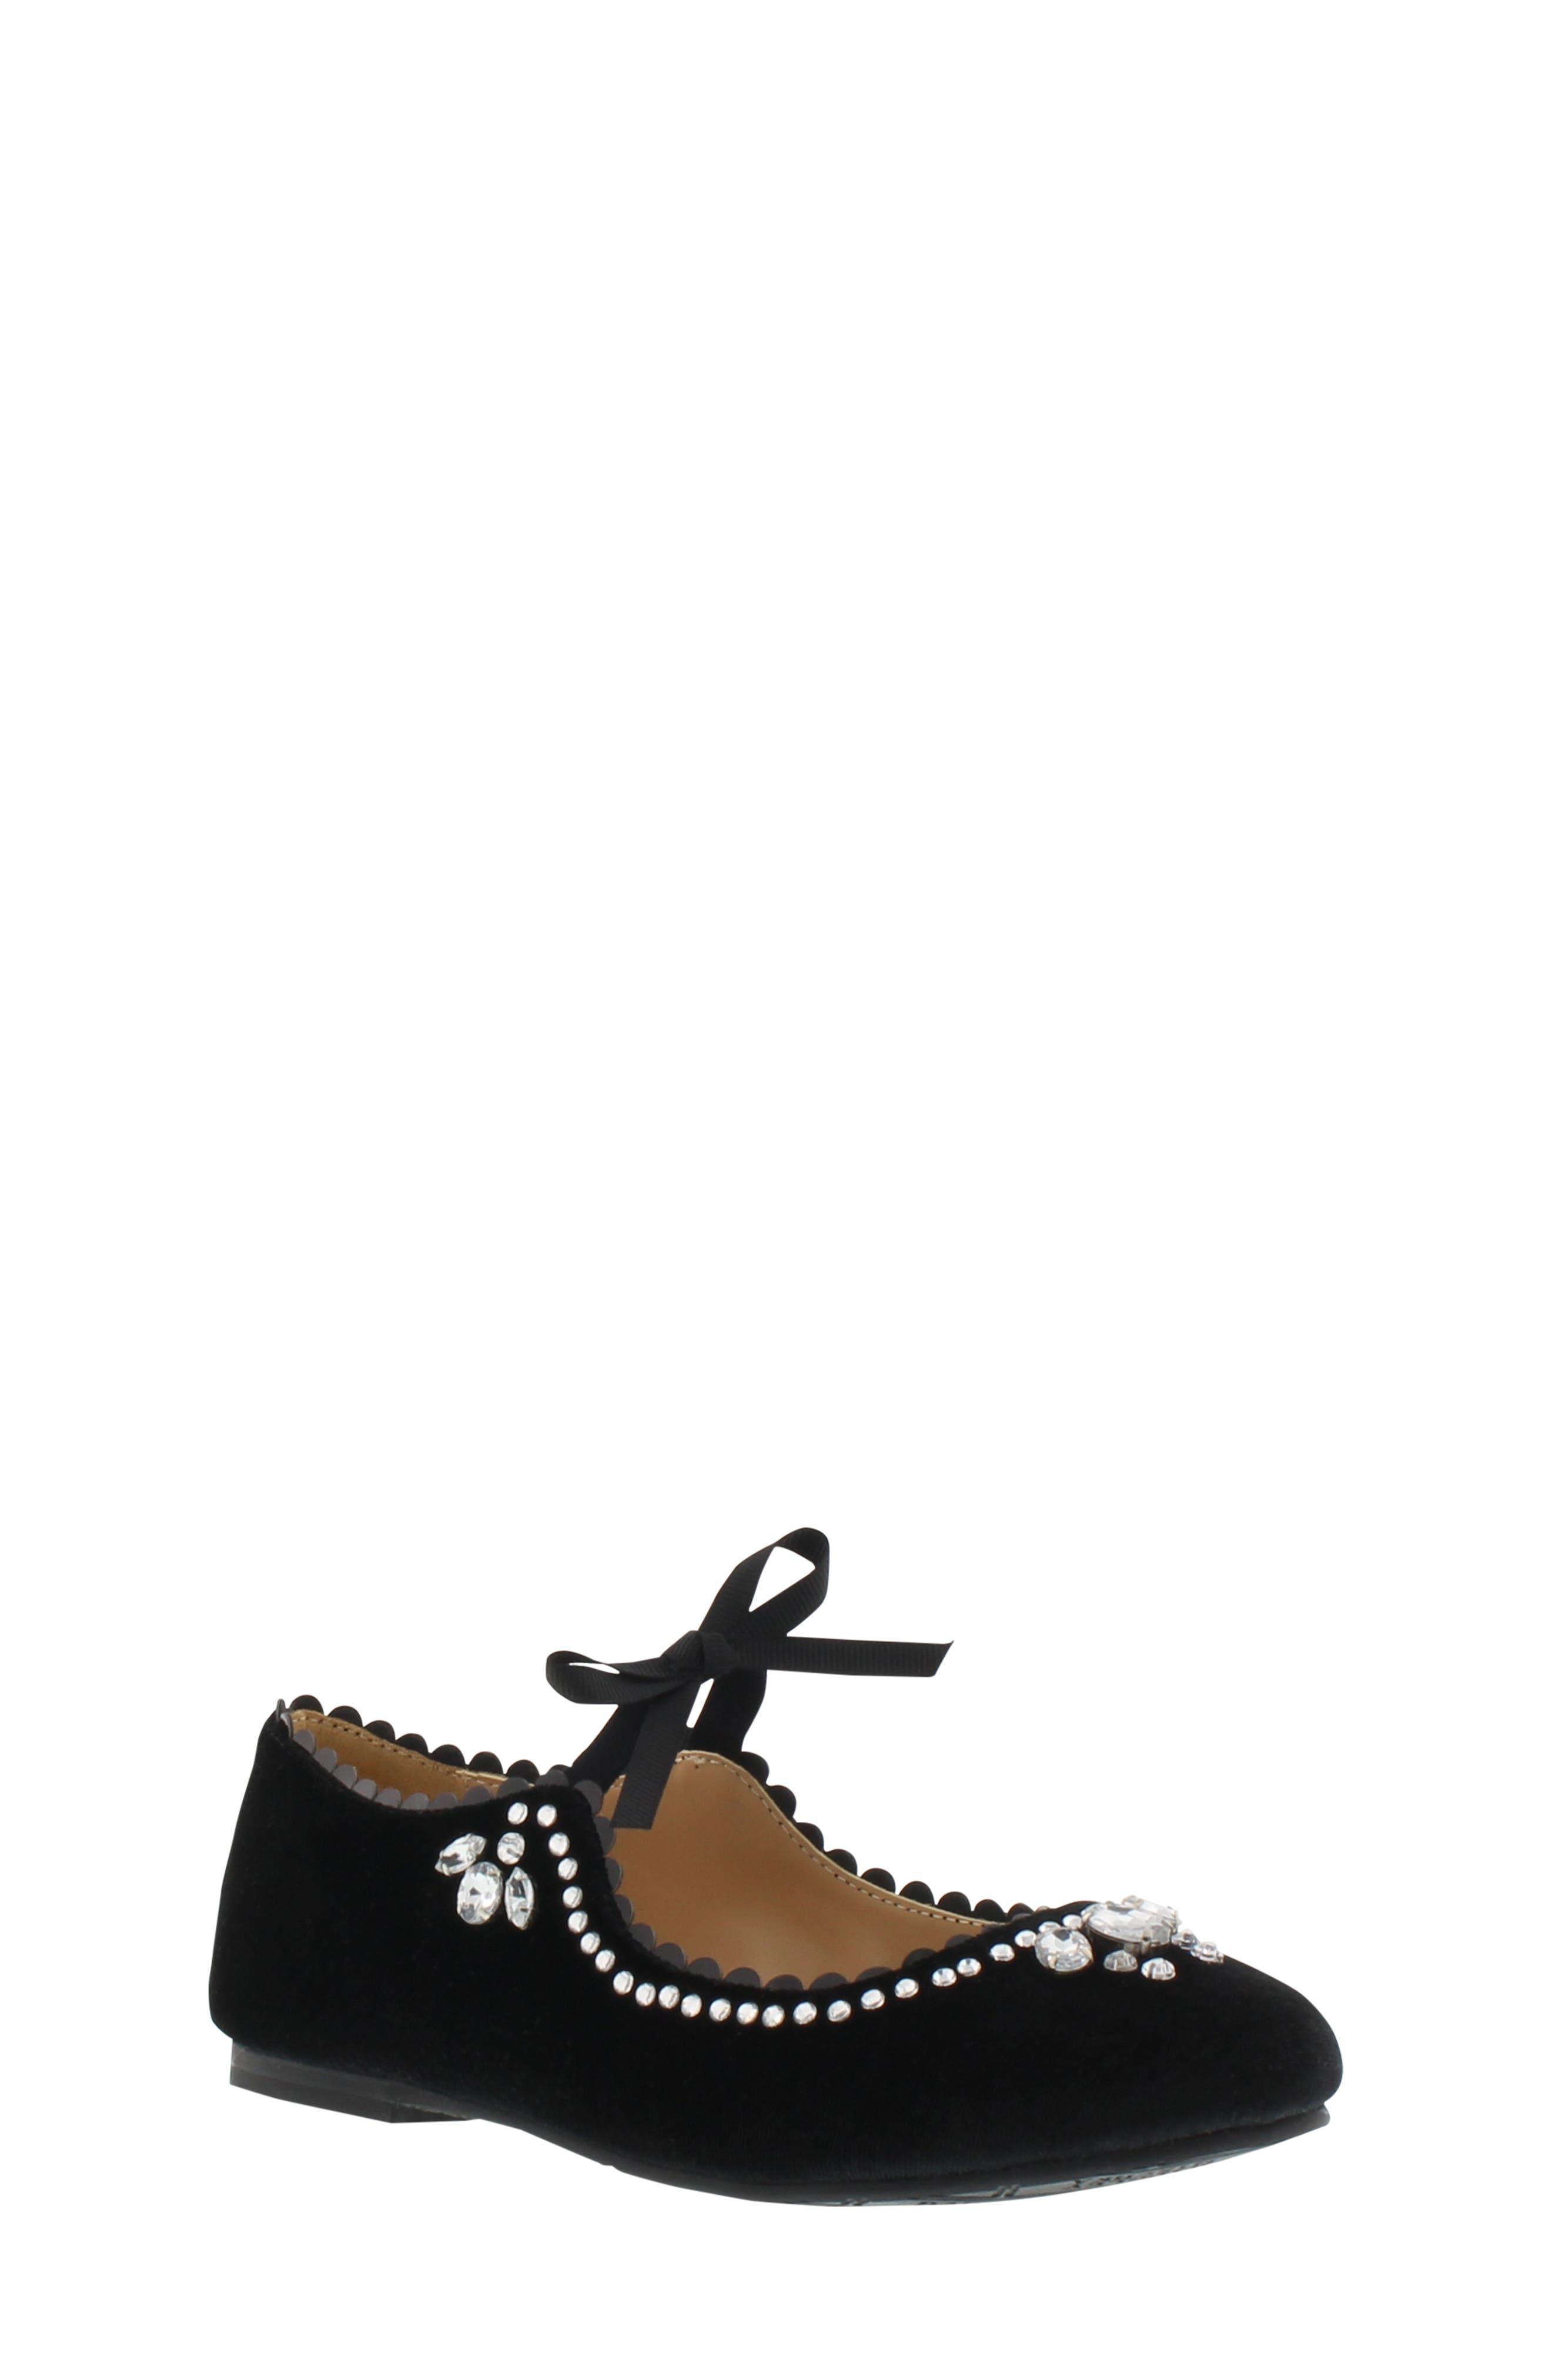 Badgley Mischka Amber Scallop Embellished Flat, Main, color, BLACK